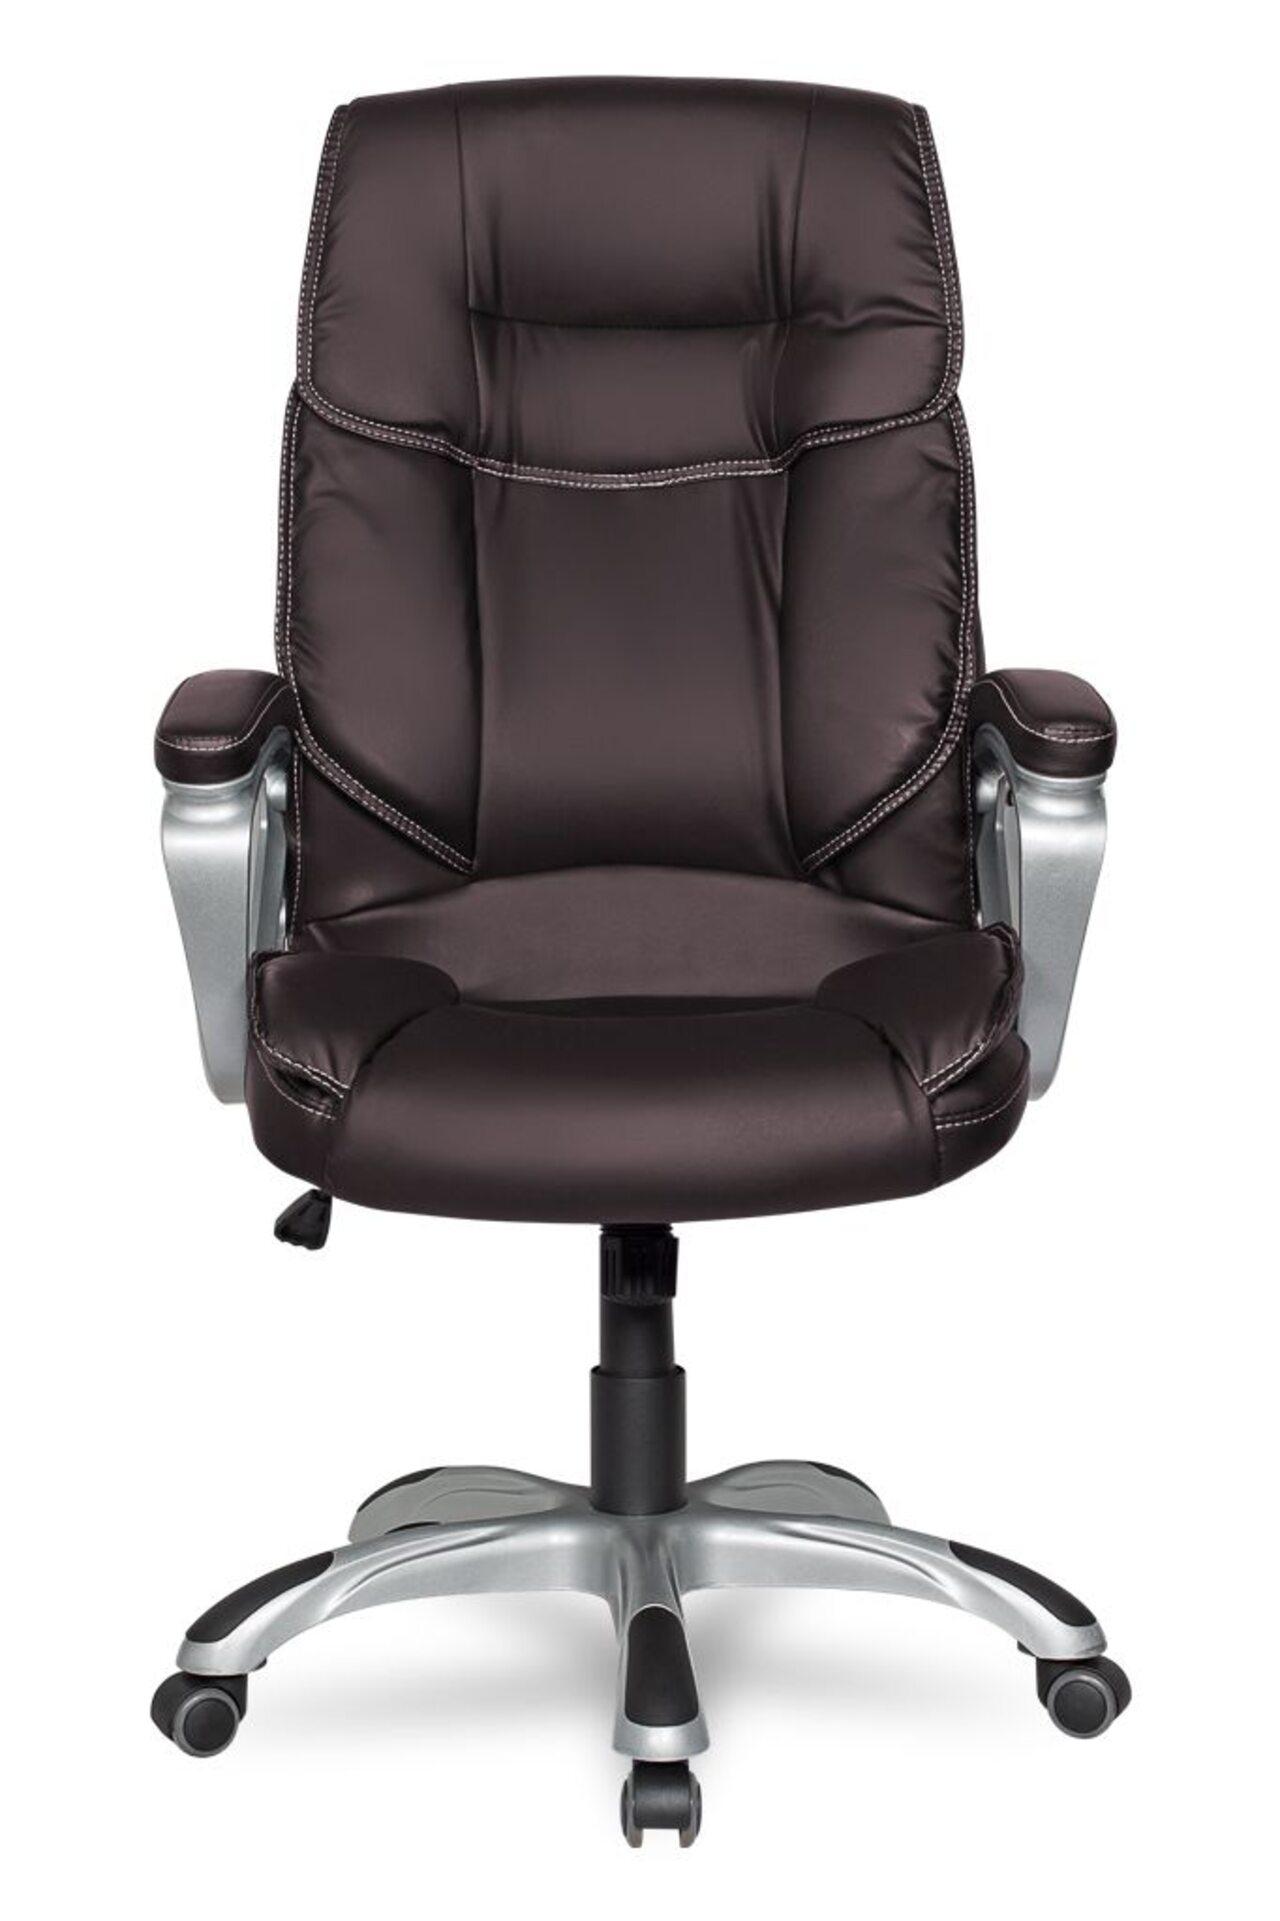 Кресло руководителя College CLG-615 LXH - фото 7